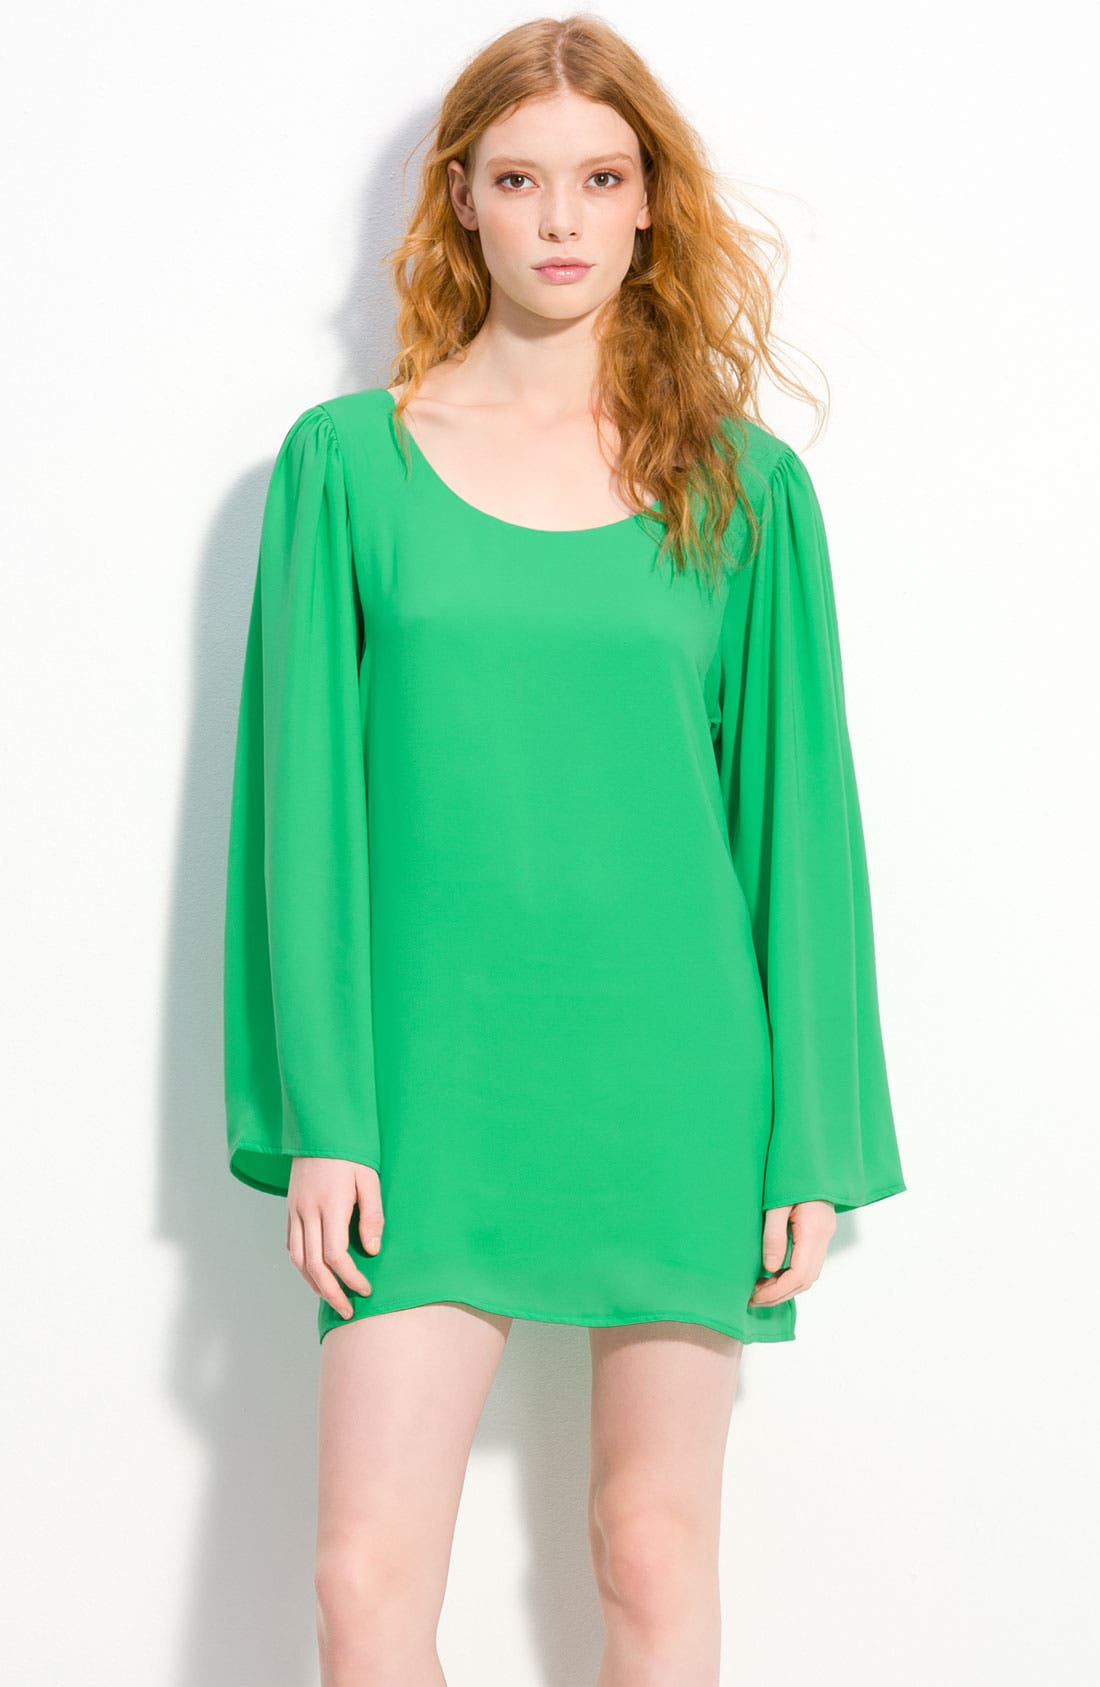 Alternate Image 1 Selected - Rory Beca 'Krish' Minidress